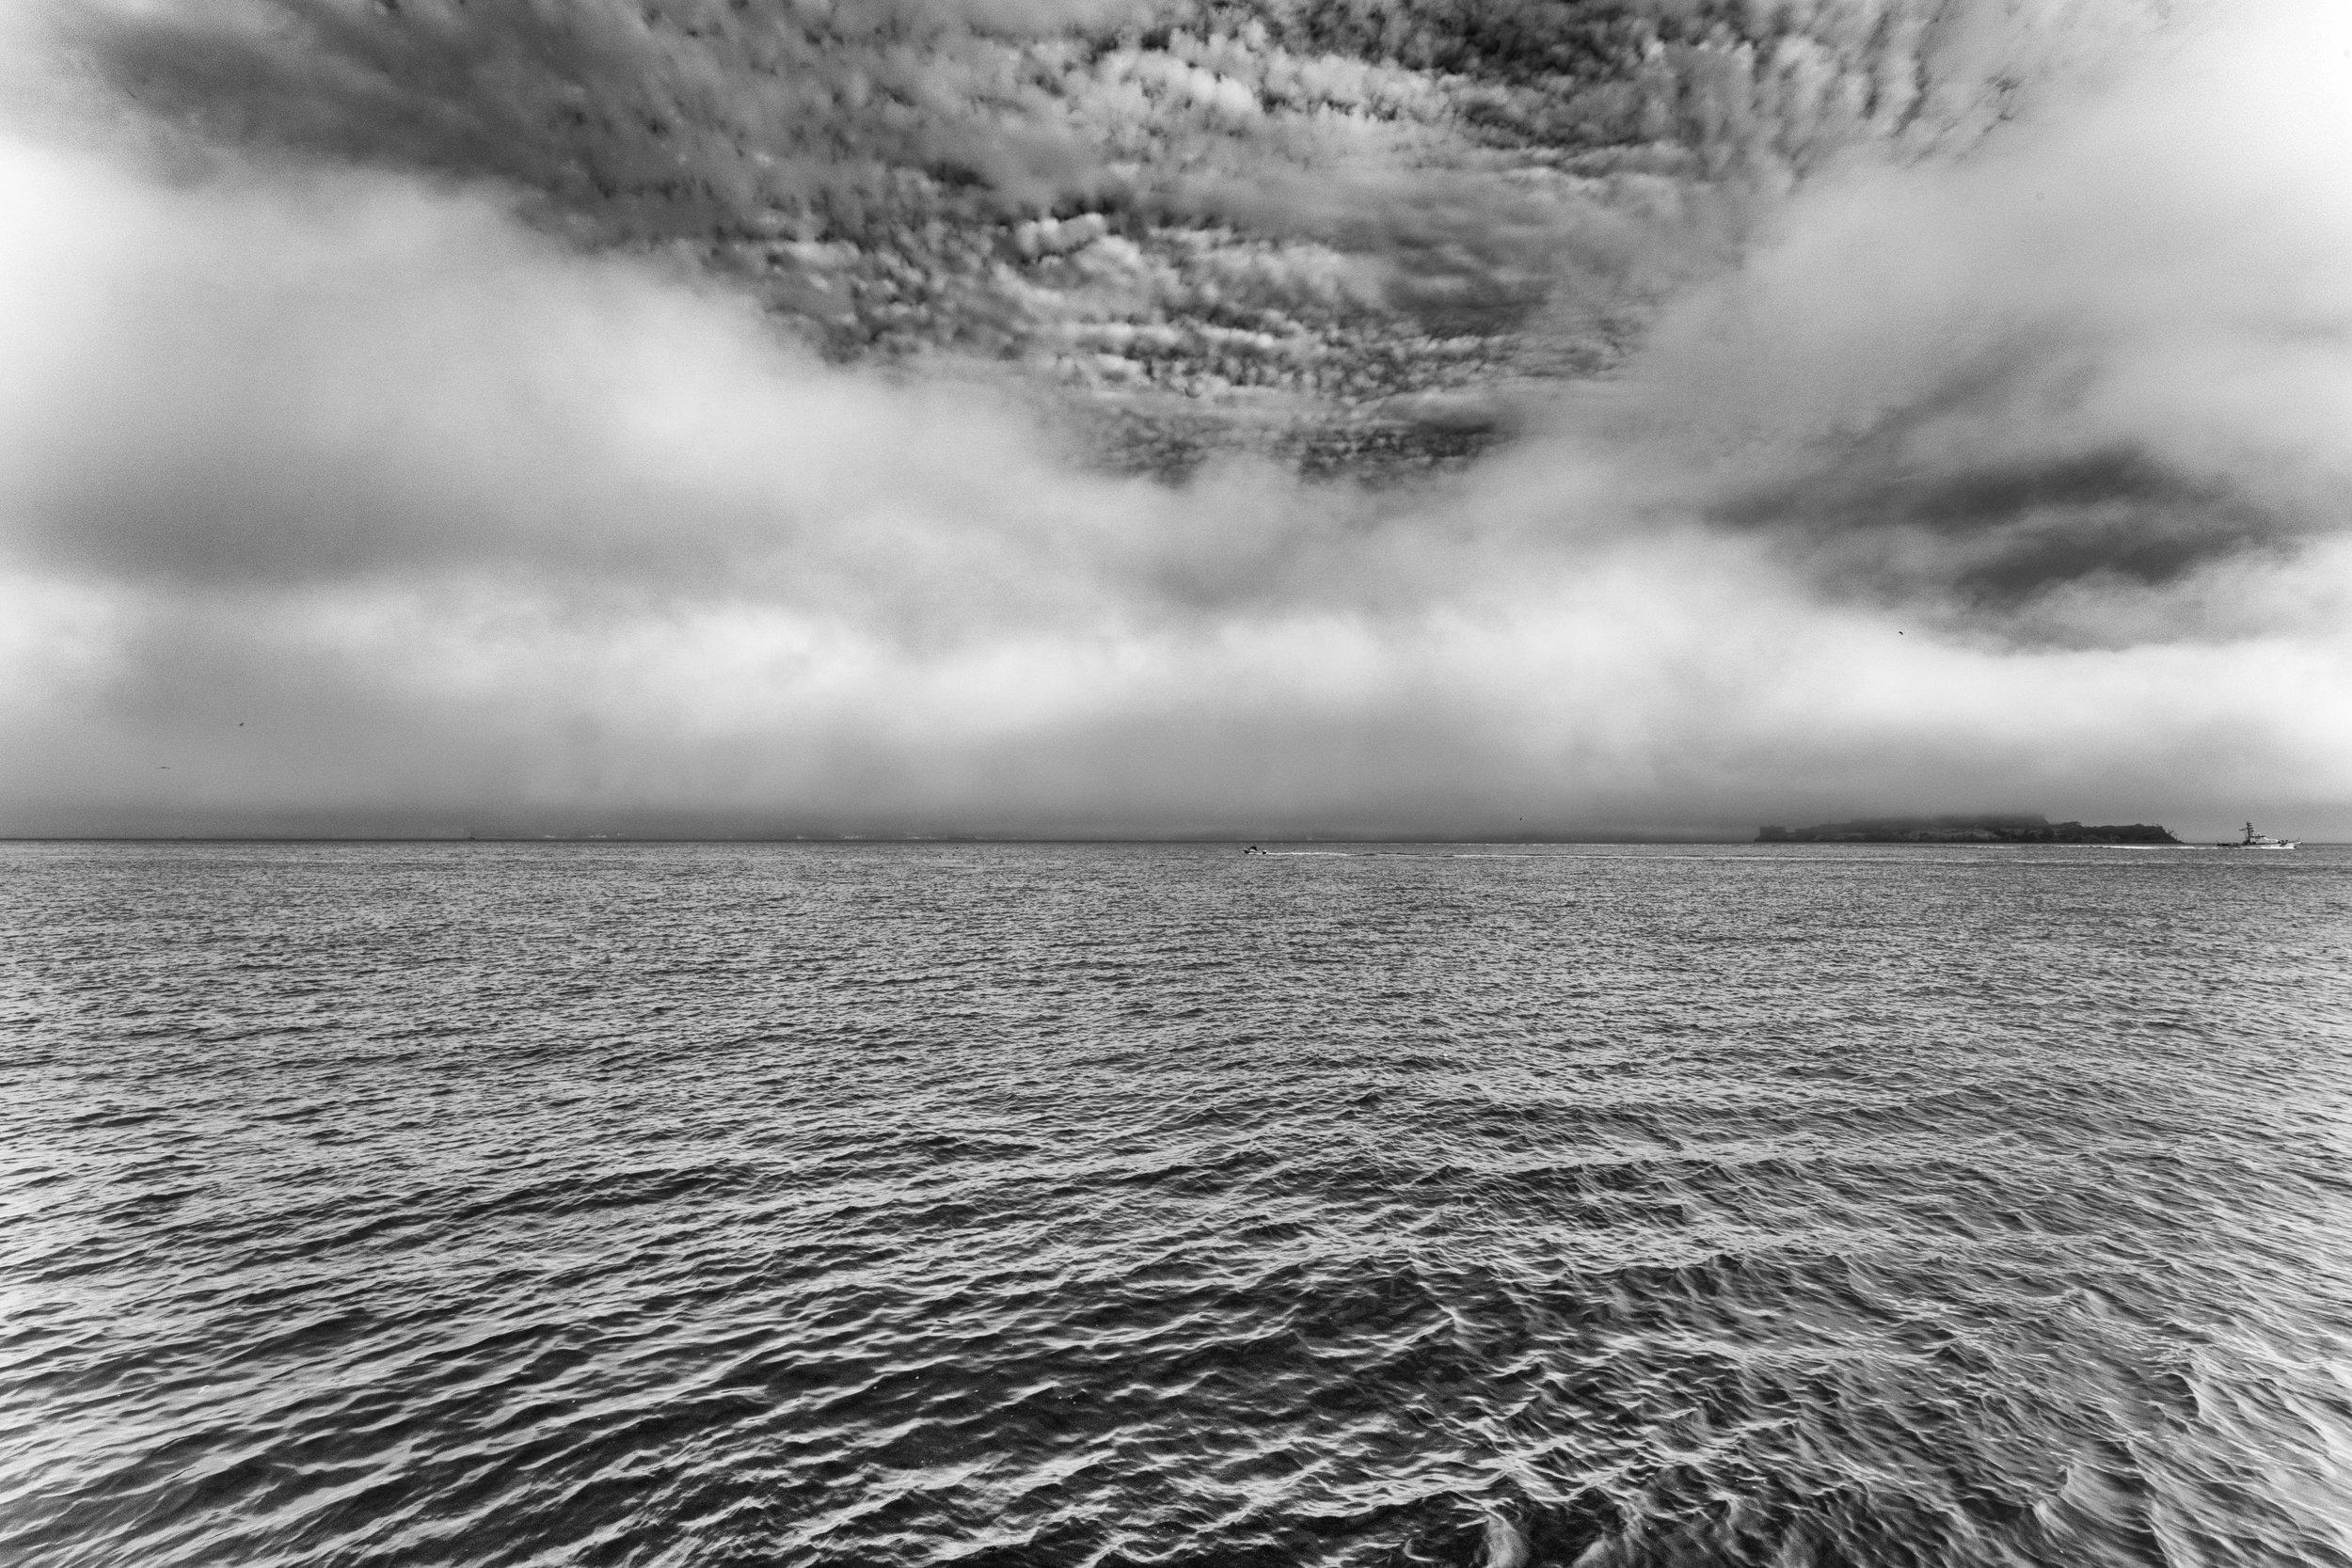 20496930-Johnston_EmergingFromTheFog-Alcatraz_Photography_8x12_150.jpg